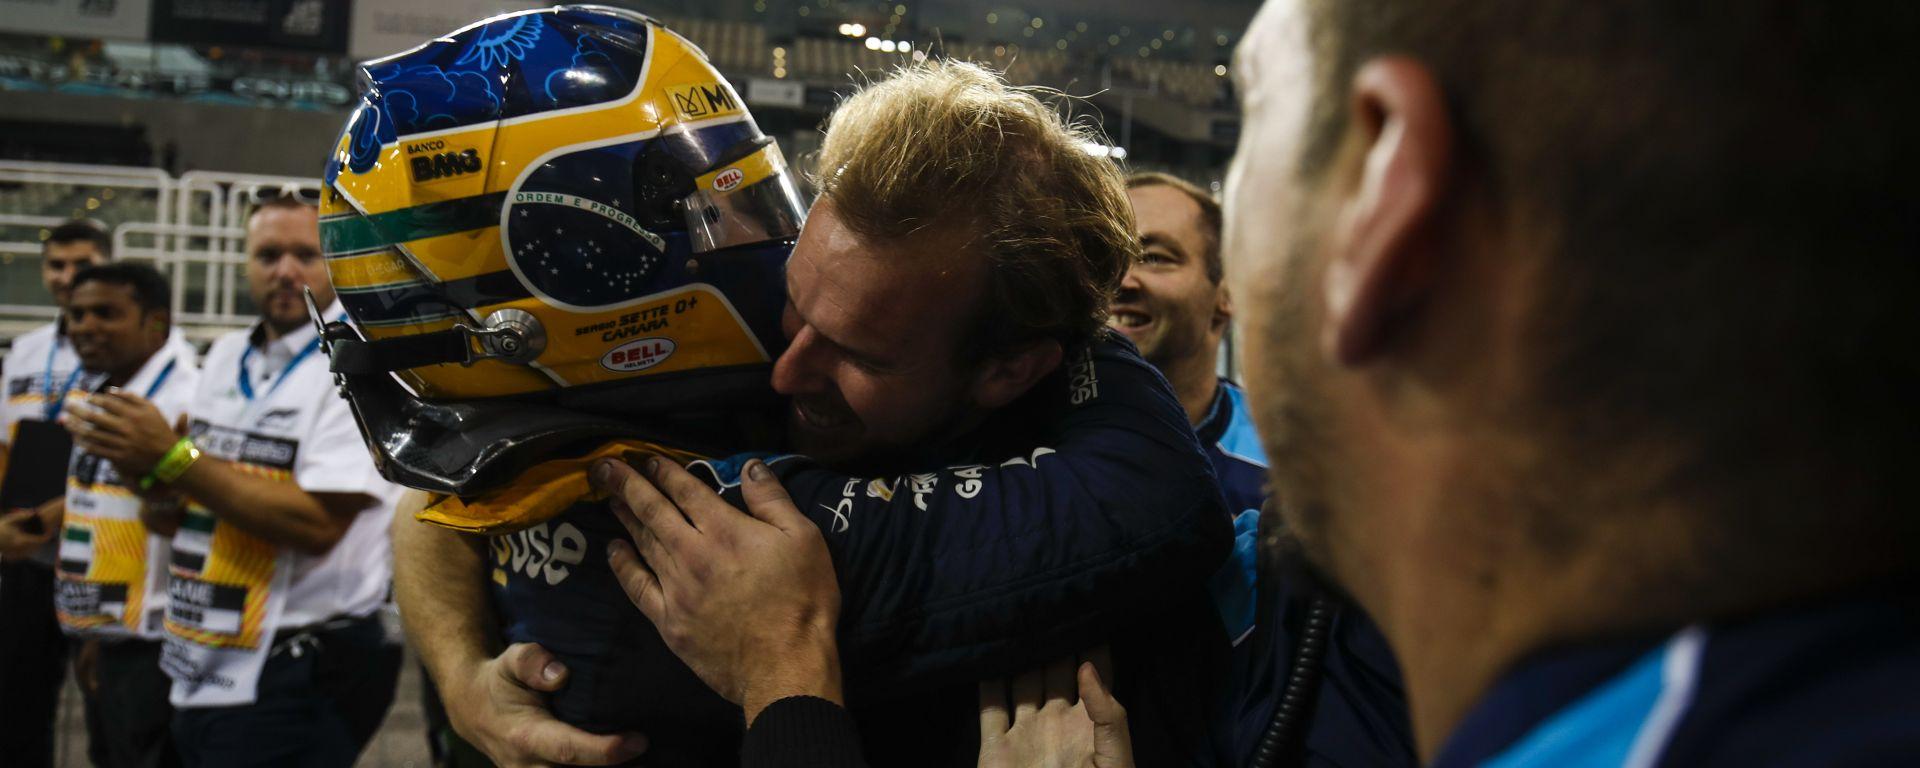 F2 GP Abu Dhabi 2019, Yas Marina: Sergio Sette Camara (DAMS) festeggia la vittoria